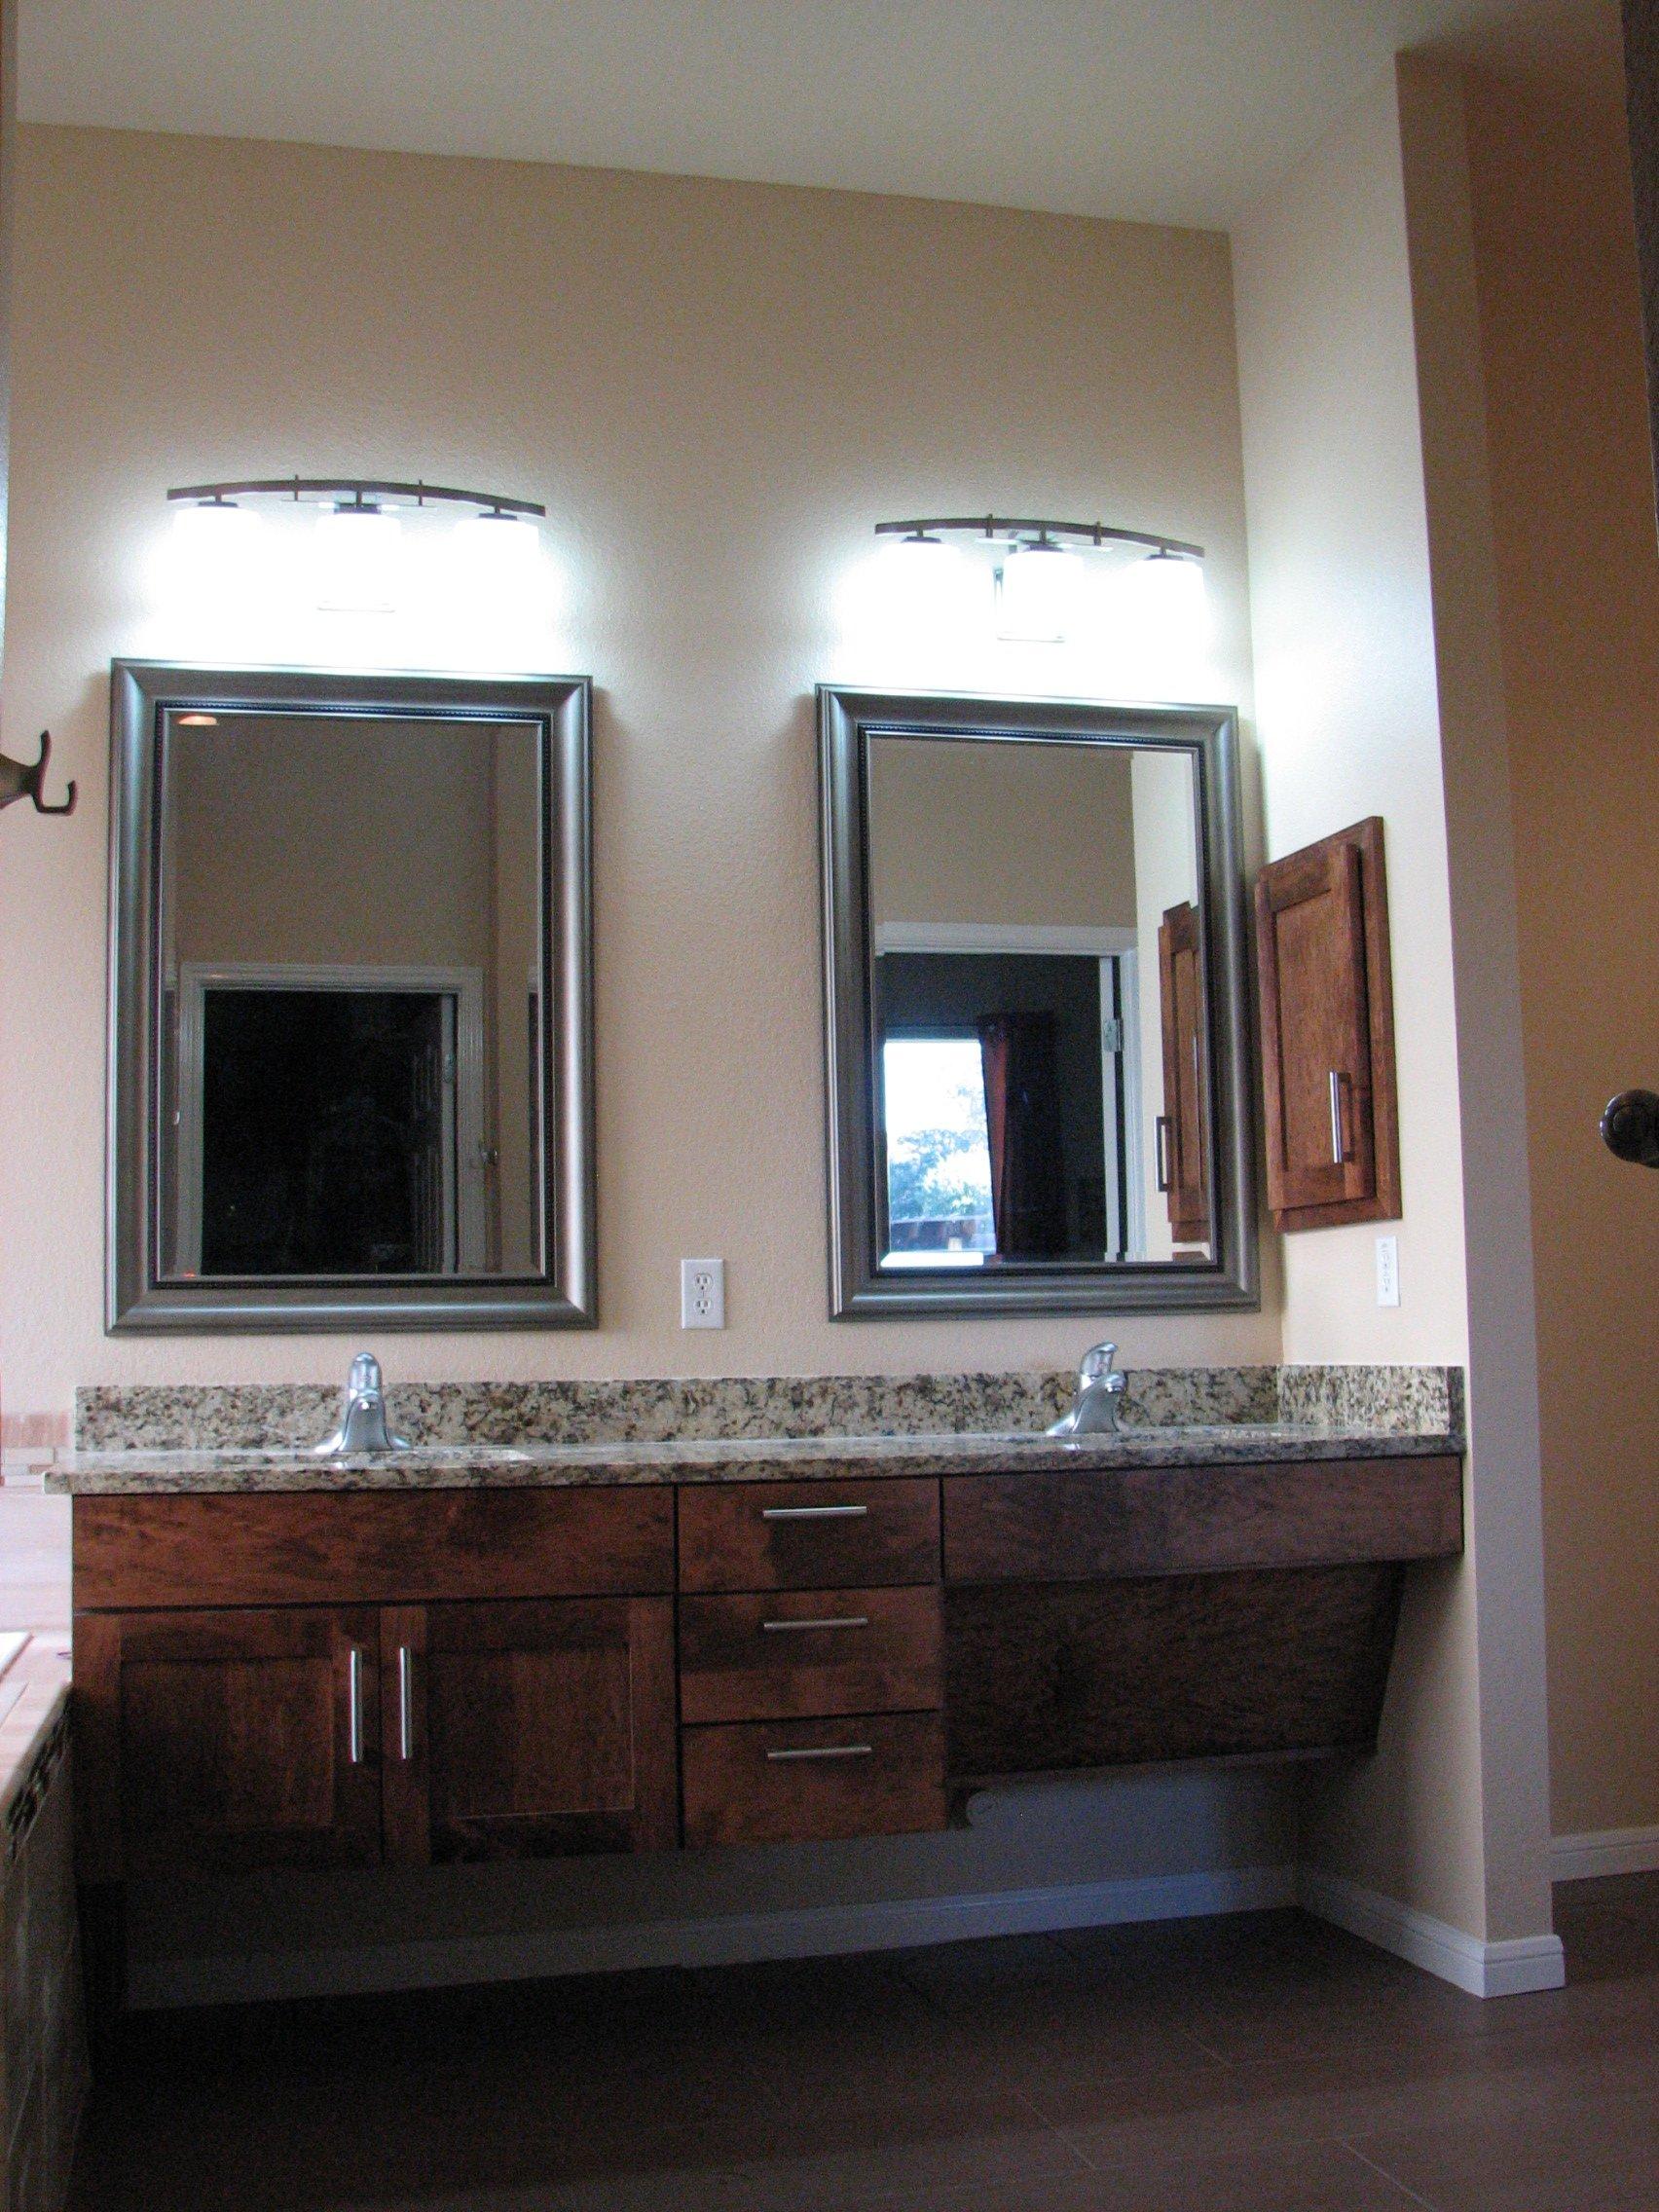 ada compliant bathroom vanity